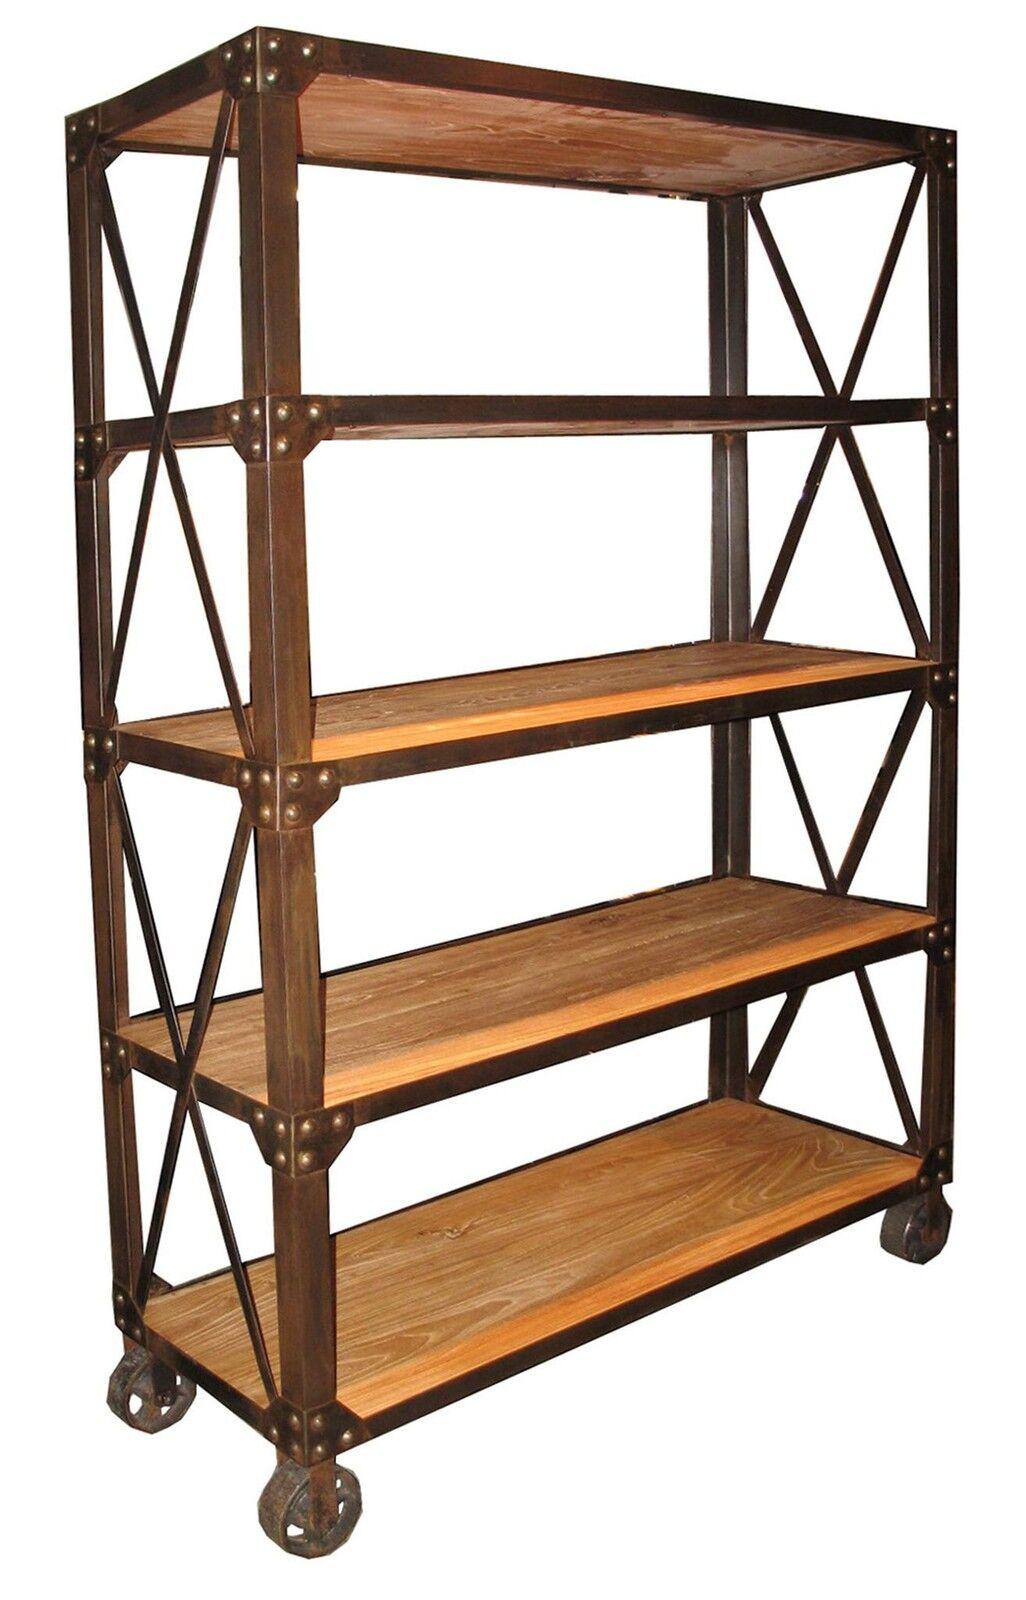 78 tall bookcase elm wood 5 shelves rusty metal on. Black Bedroom Furniture Sets. Home Design Ideas